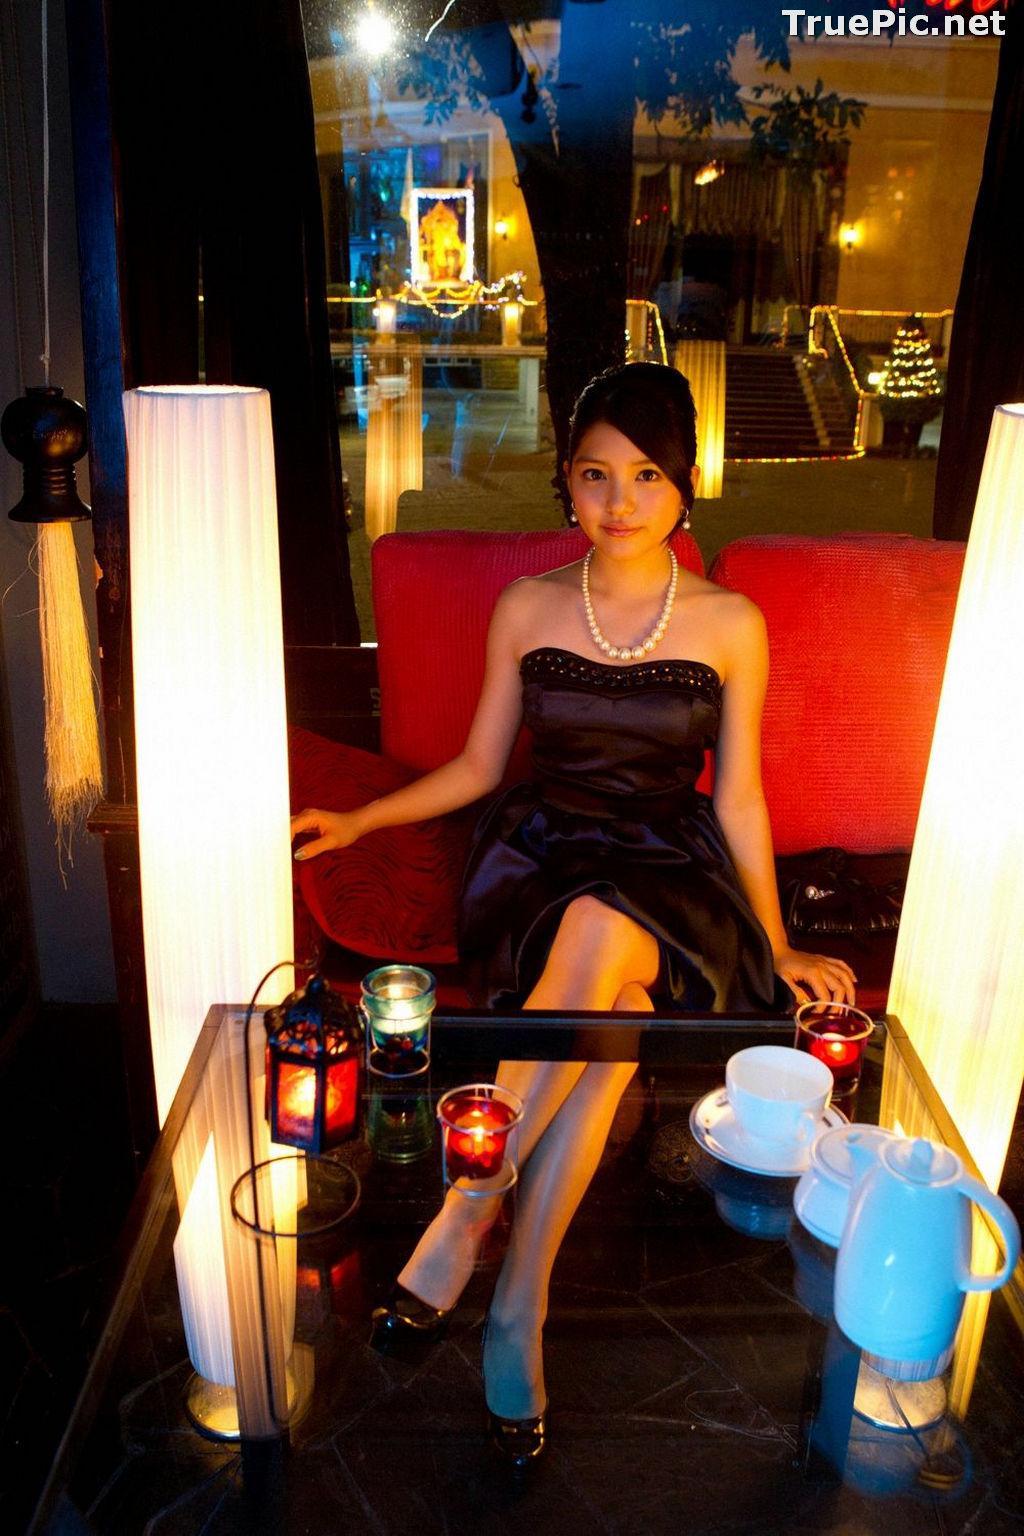 Image [YS Web] Vol.506 - Japanese Actress and Singer - Umika Kawashima - TruePic.net - Picture-13